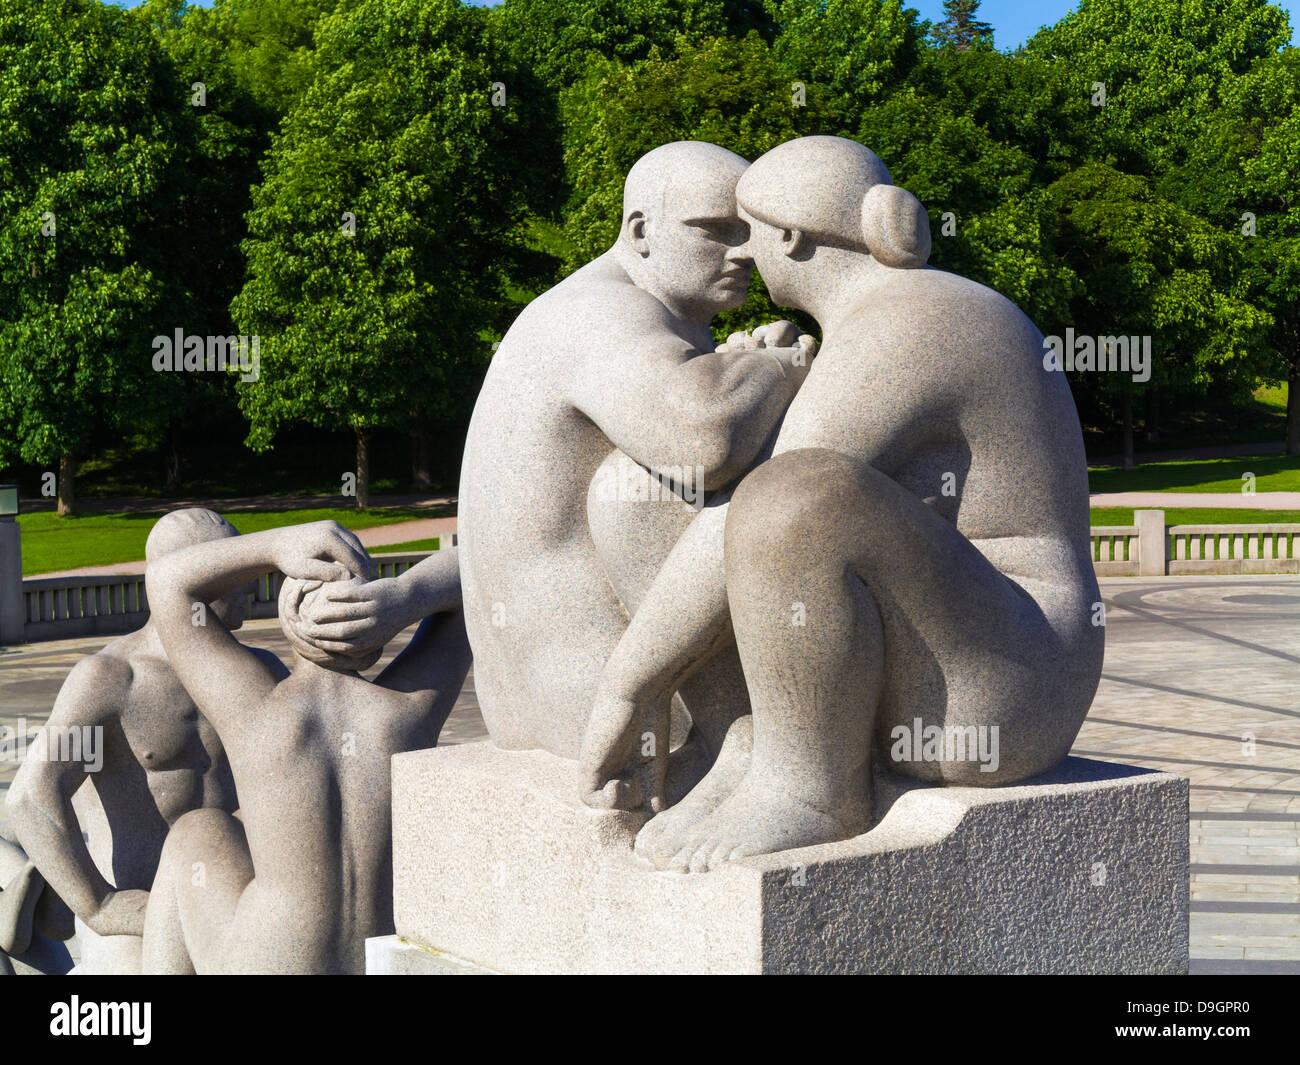 Oslo, Norway - Sculptures in Vigelandsparken Sculpture Park in Oslo, Norway - Stock Image